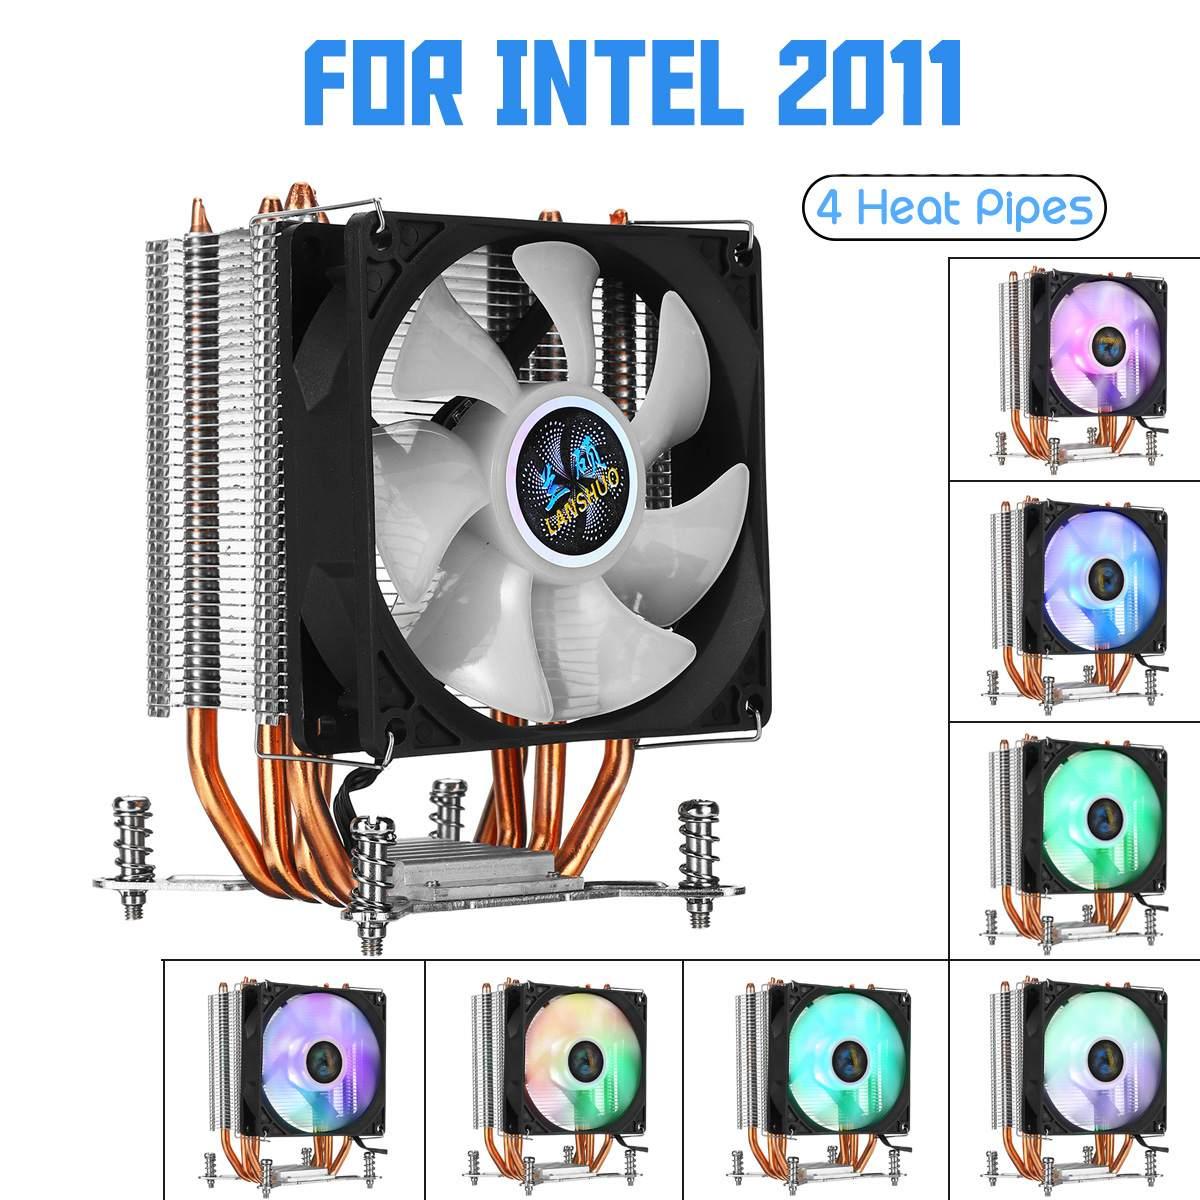 CPU Cooler Fan 4 Copper Heatpipesipes for Aurora Light Cooling Fan 90mm with RGB for Intel LGA 2011 CPU Cooler Heatsink Radiator